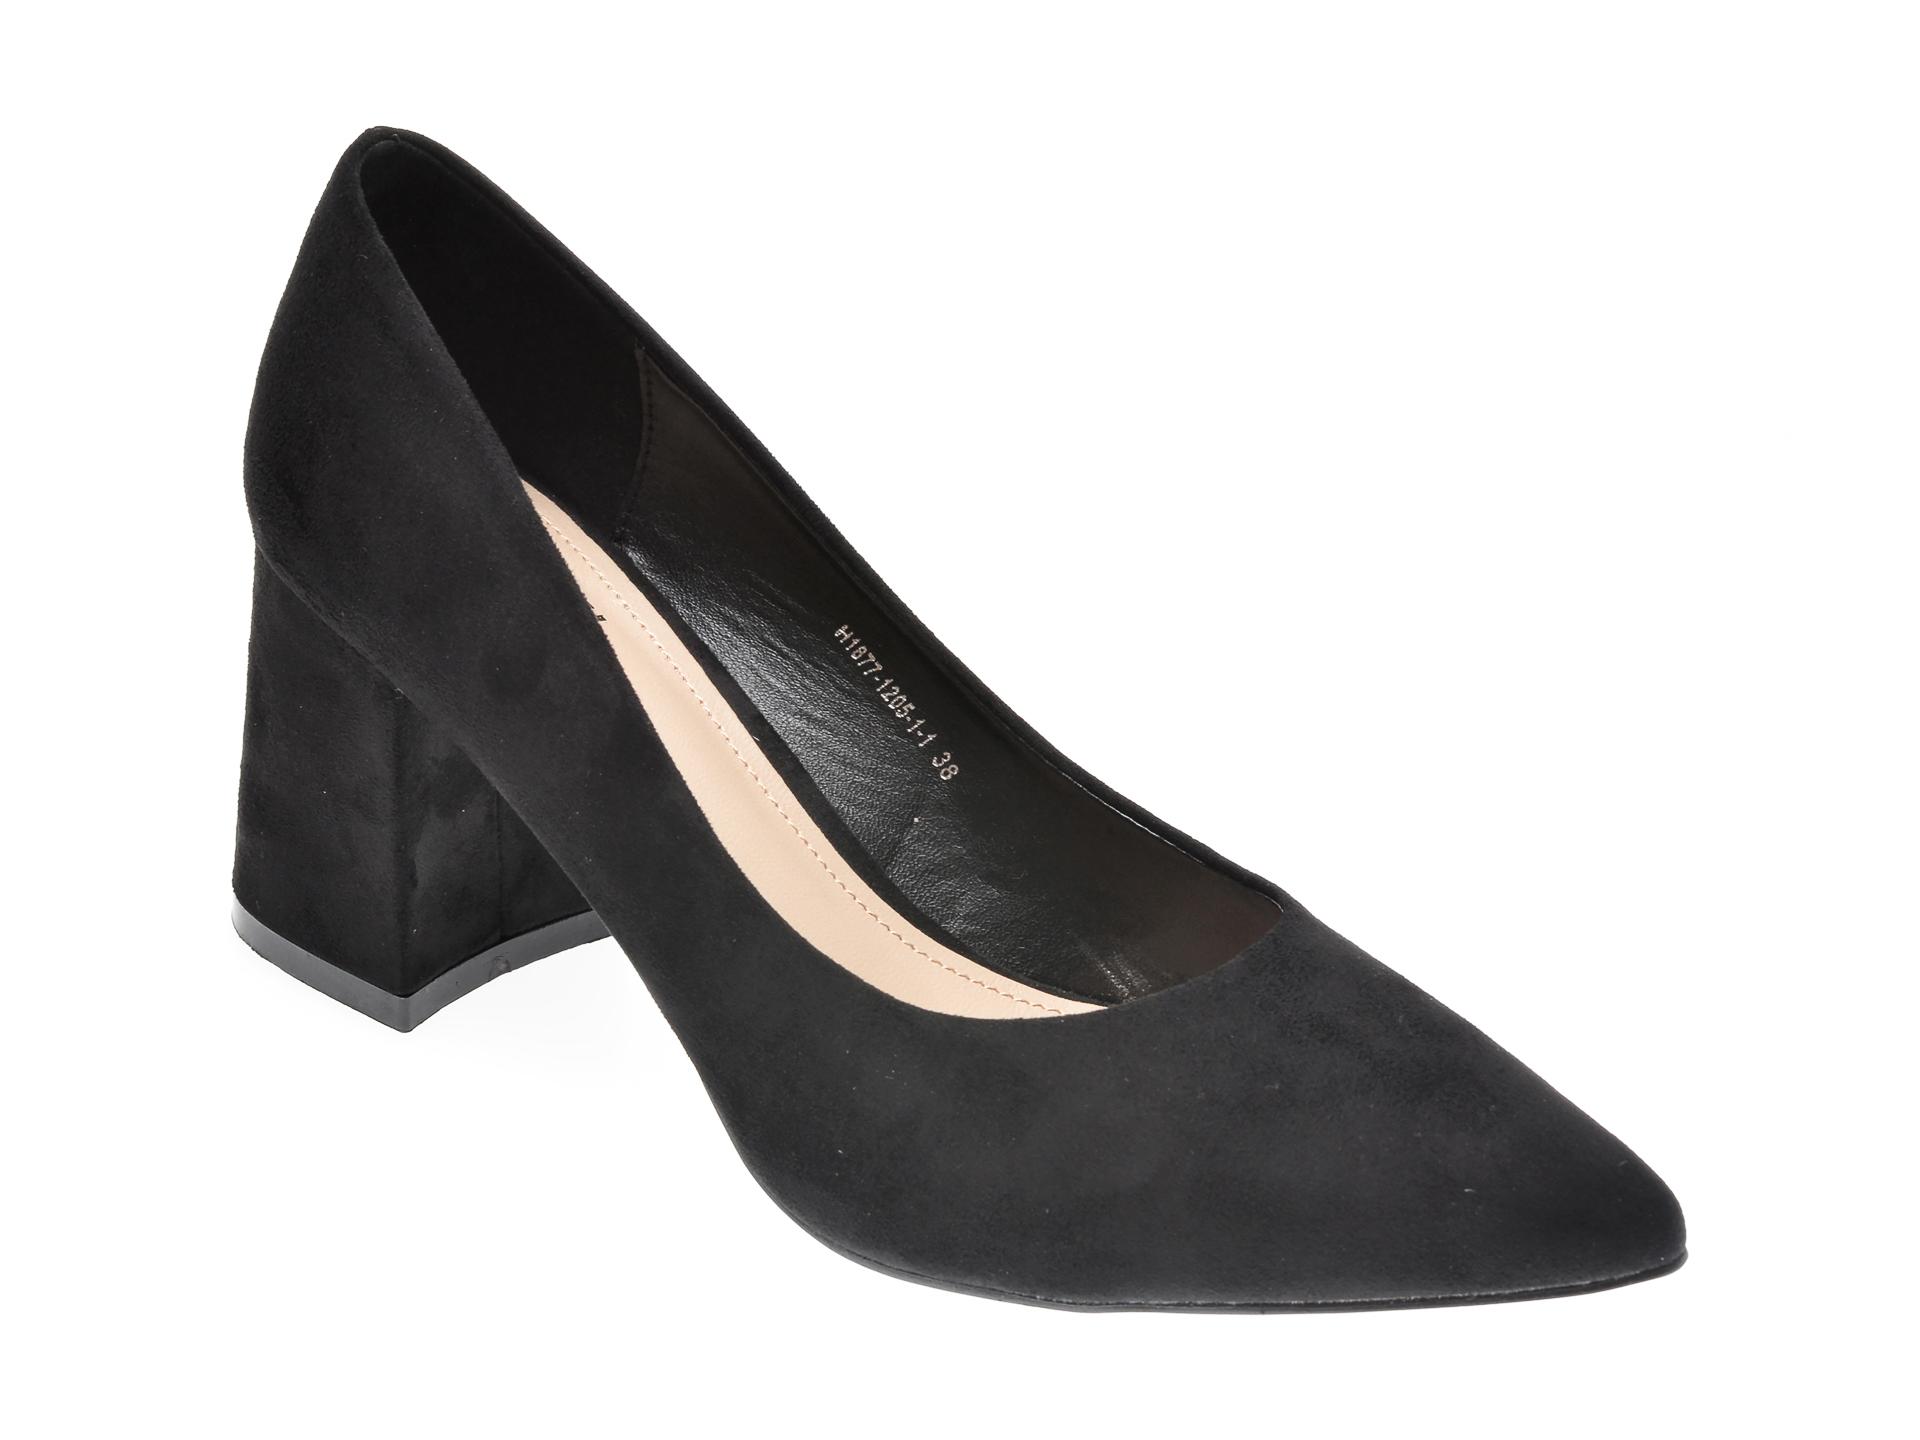 Pantofi RIO FIORE negri, H1877, din piele ecologica imagine otter.ro